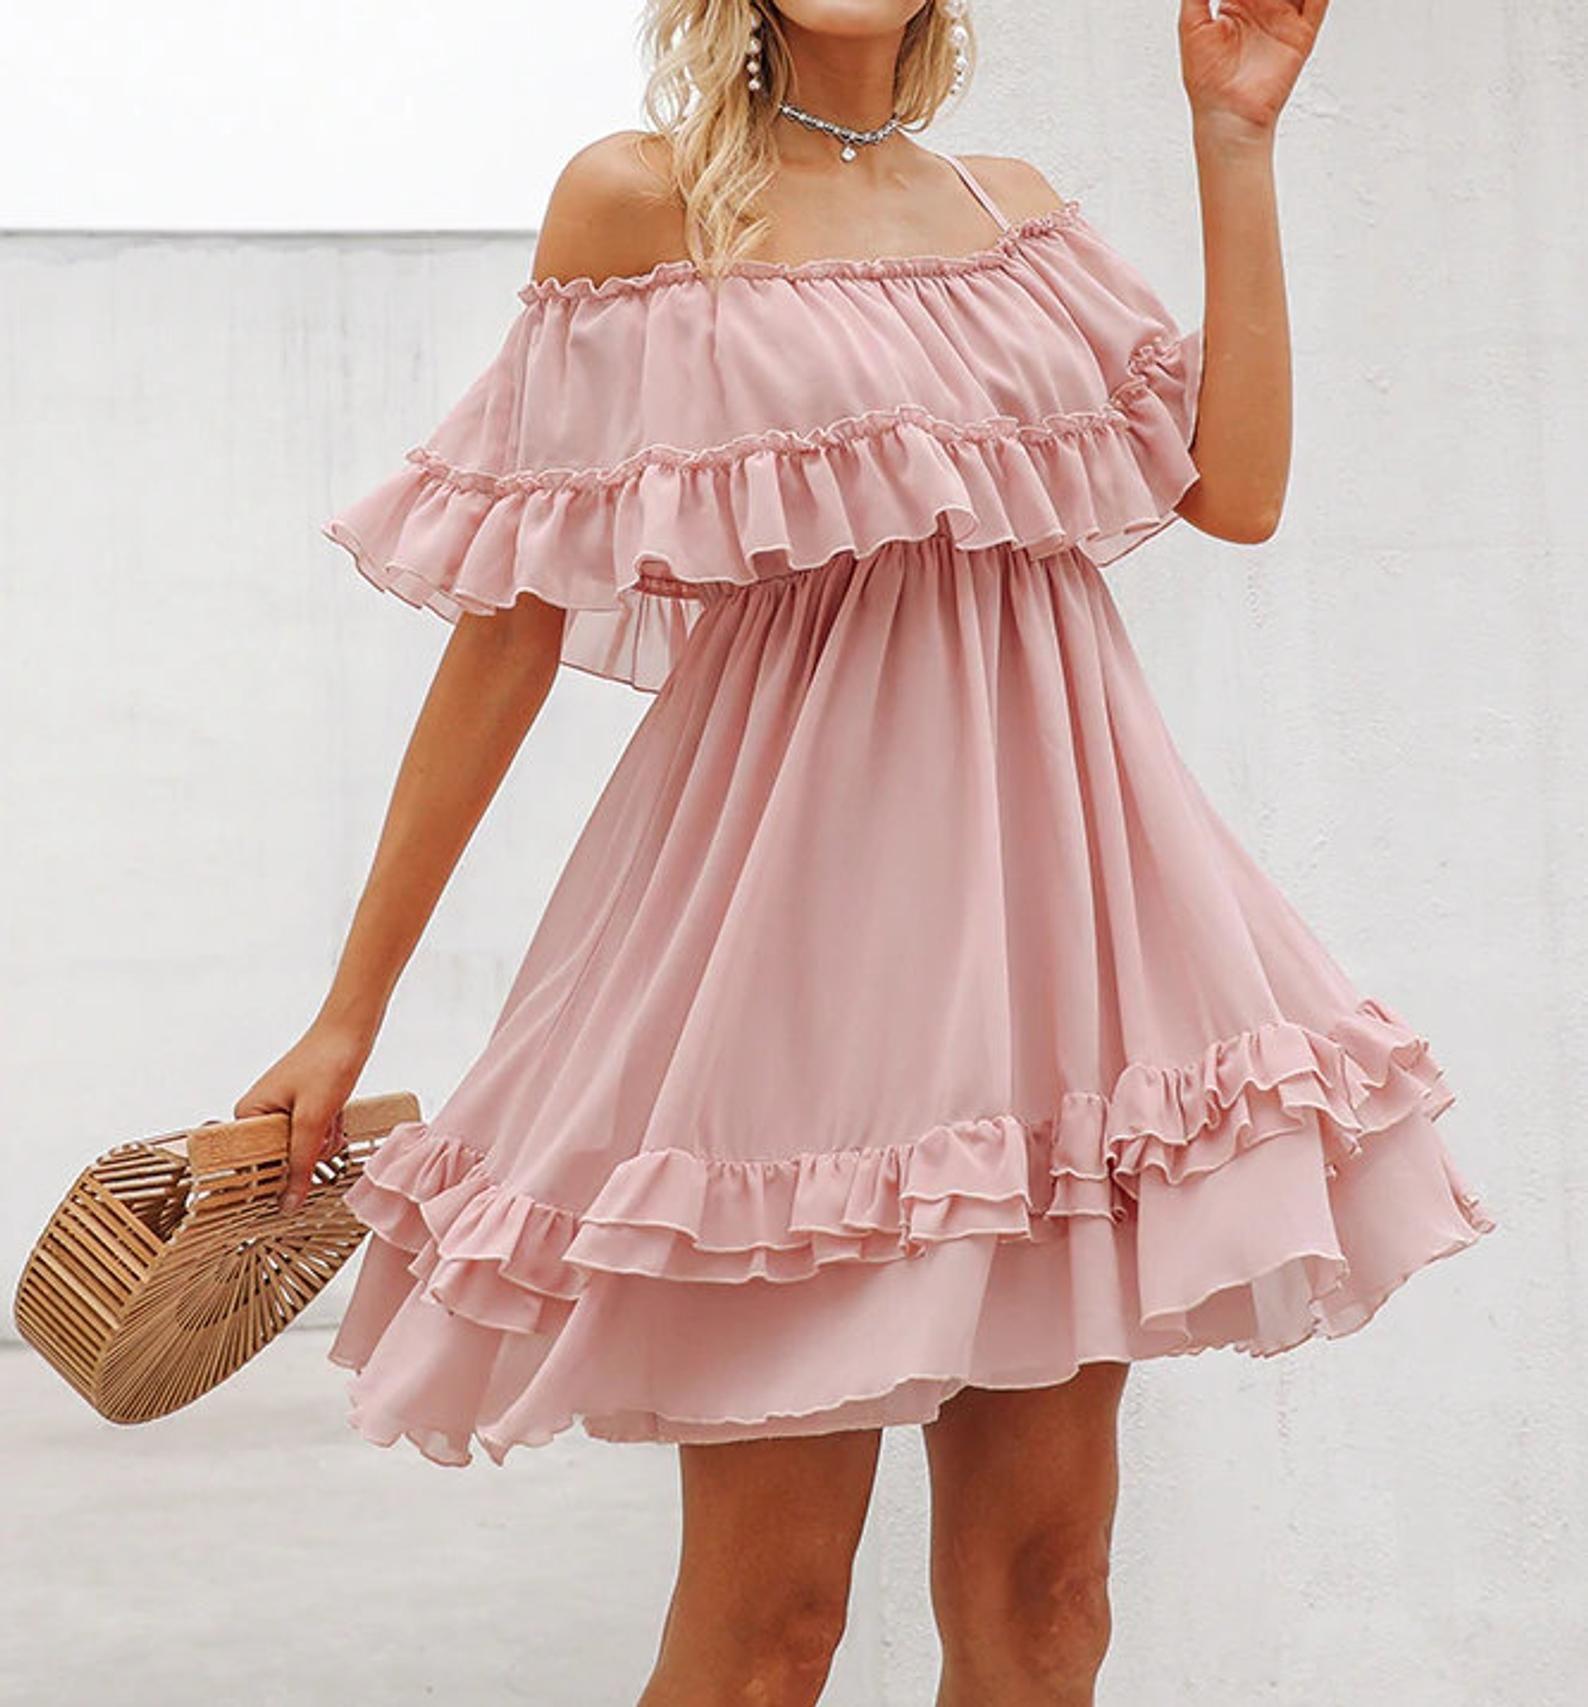 Pin By Maria Cruz On Dresses Short Summer Dresses Short Dresses Casual Short Dresses [ 1707 x 1588 Pixel ]